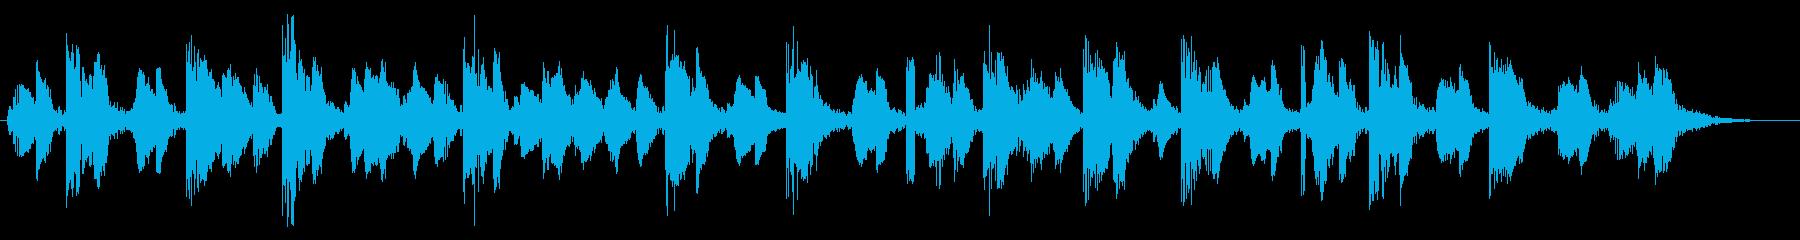 KANT近未来ロボット言語効果音1の再生済みの波形